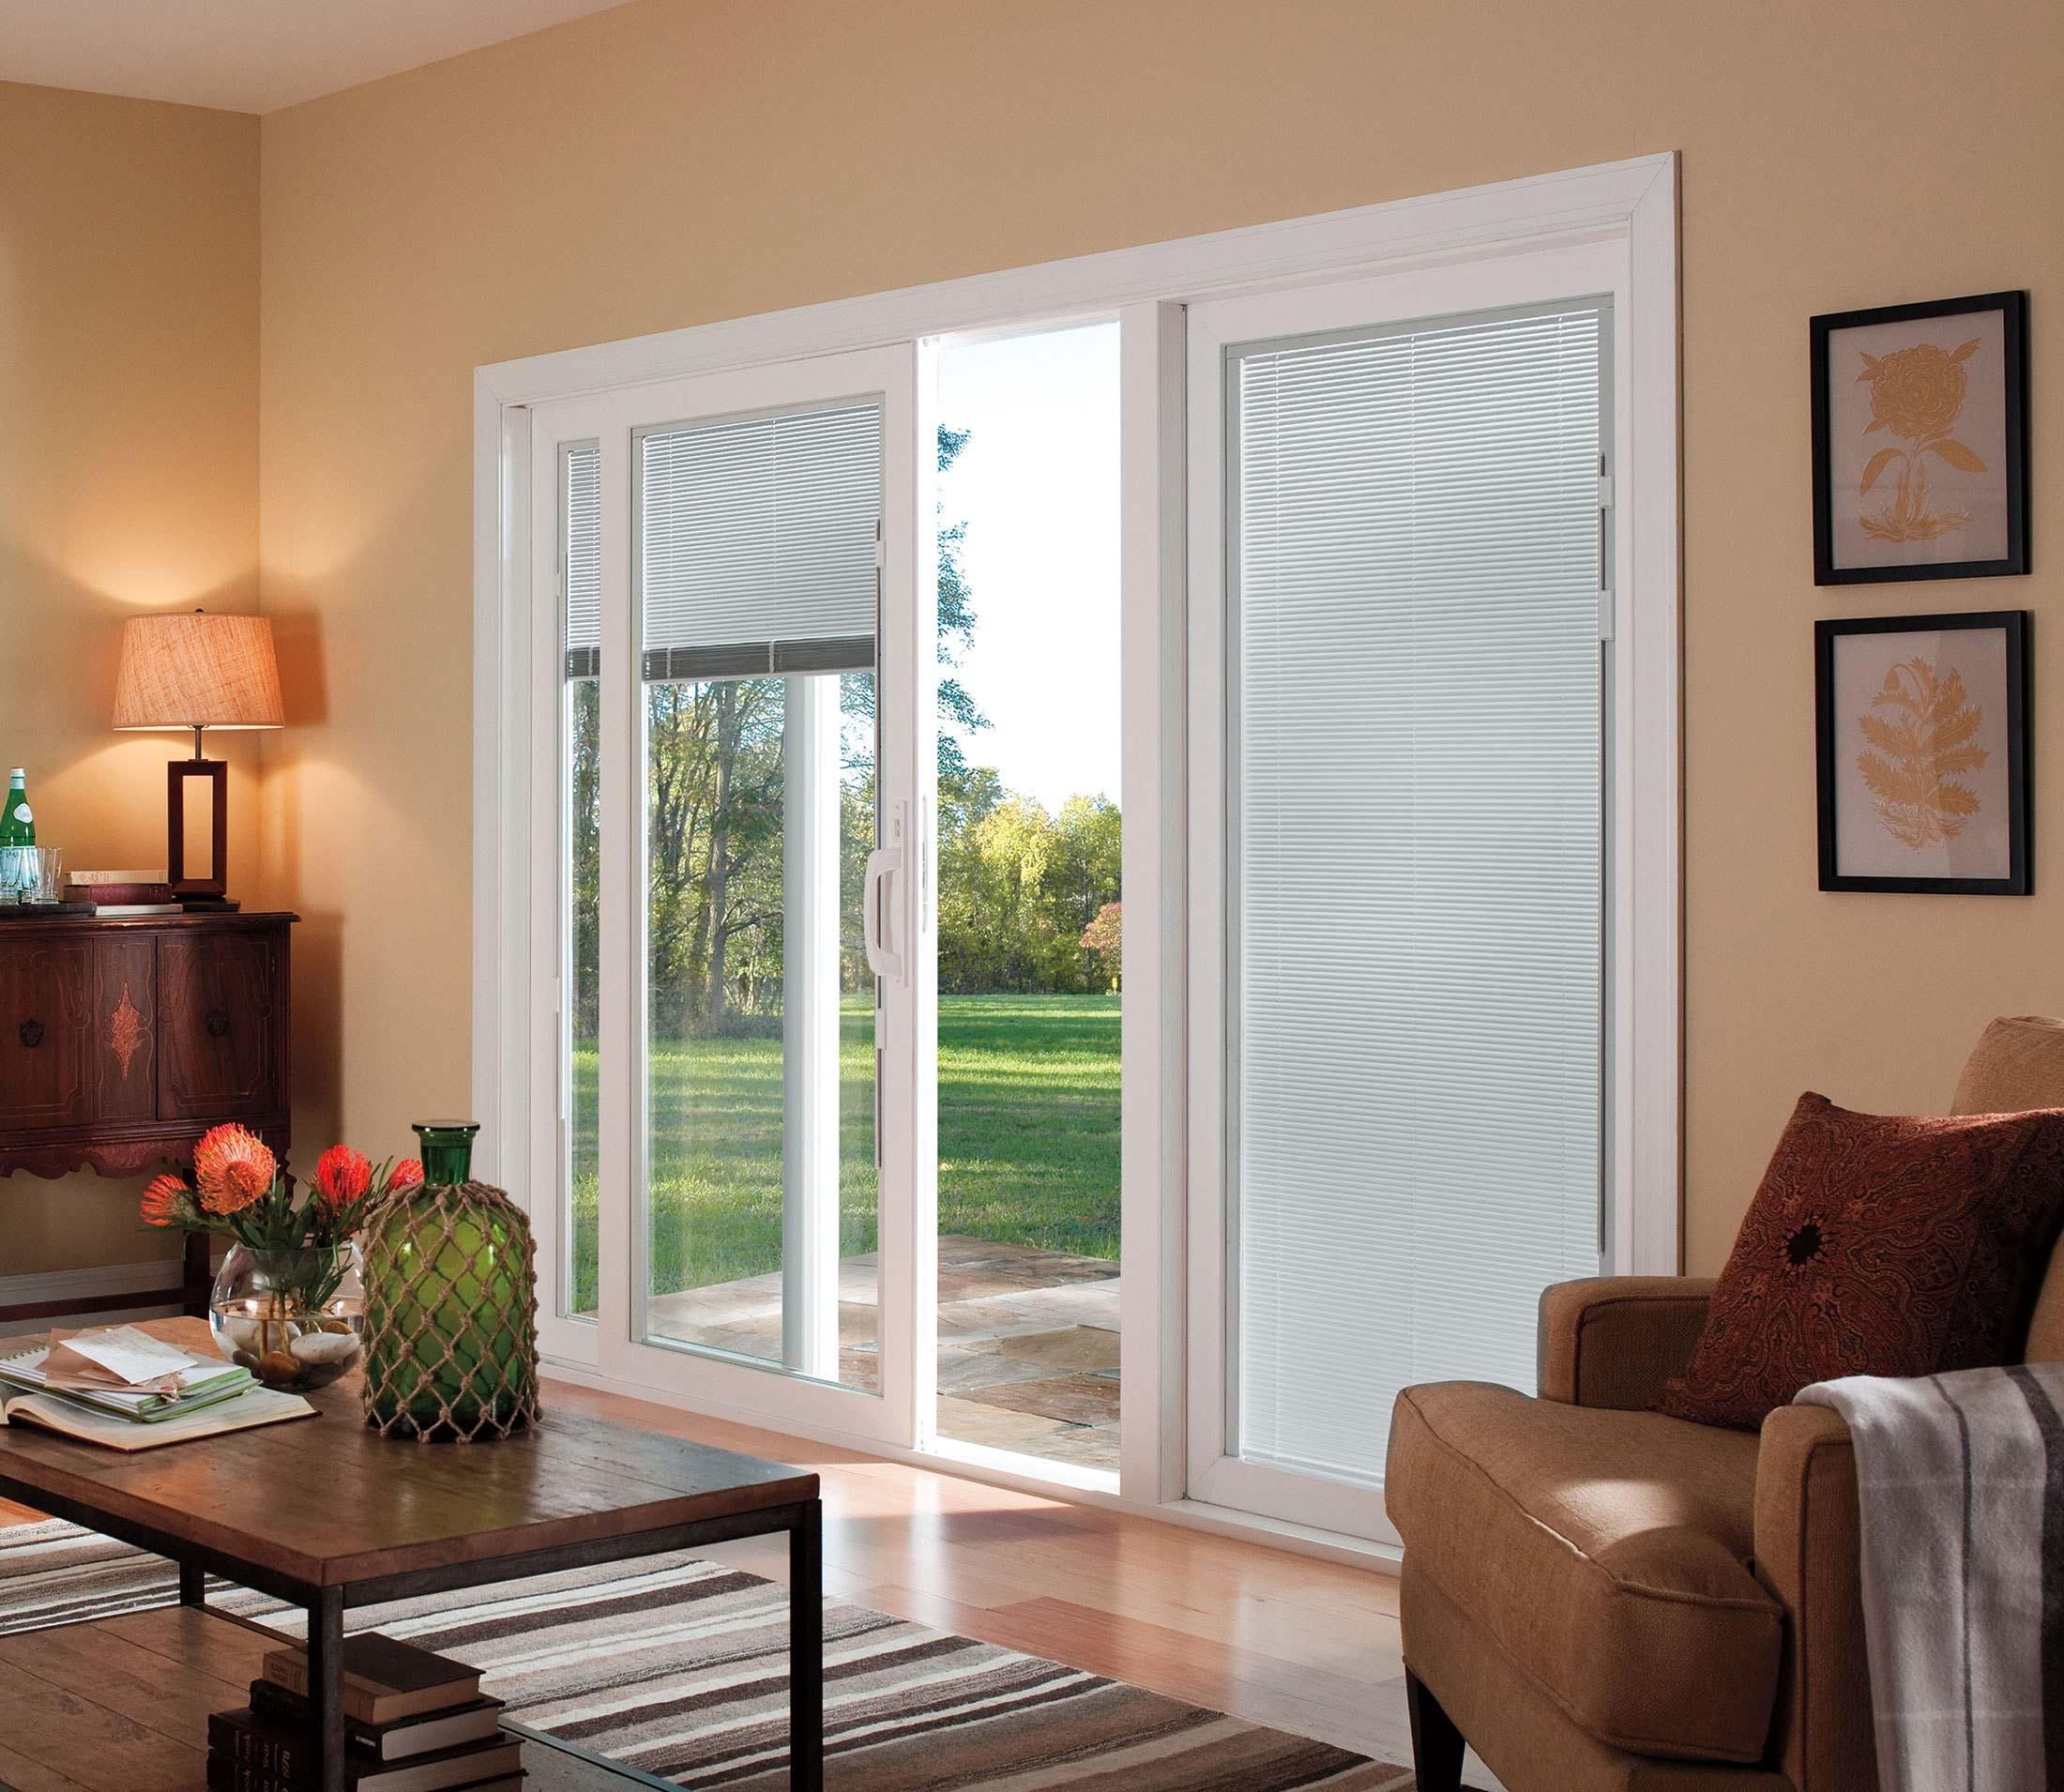 Triple Pane Sliding Glass Door With BlindsTriple Pane Sliding Glass Door With Blinds